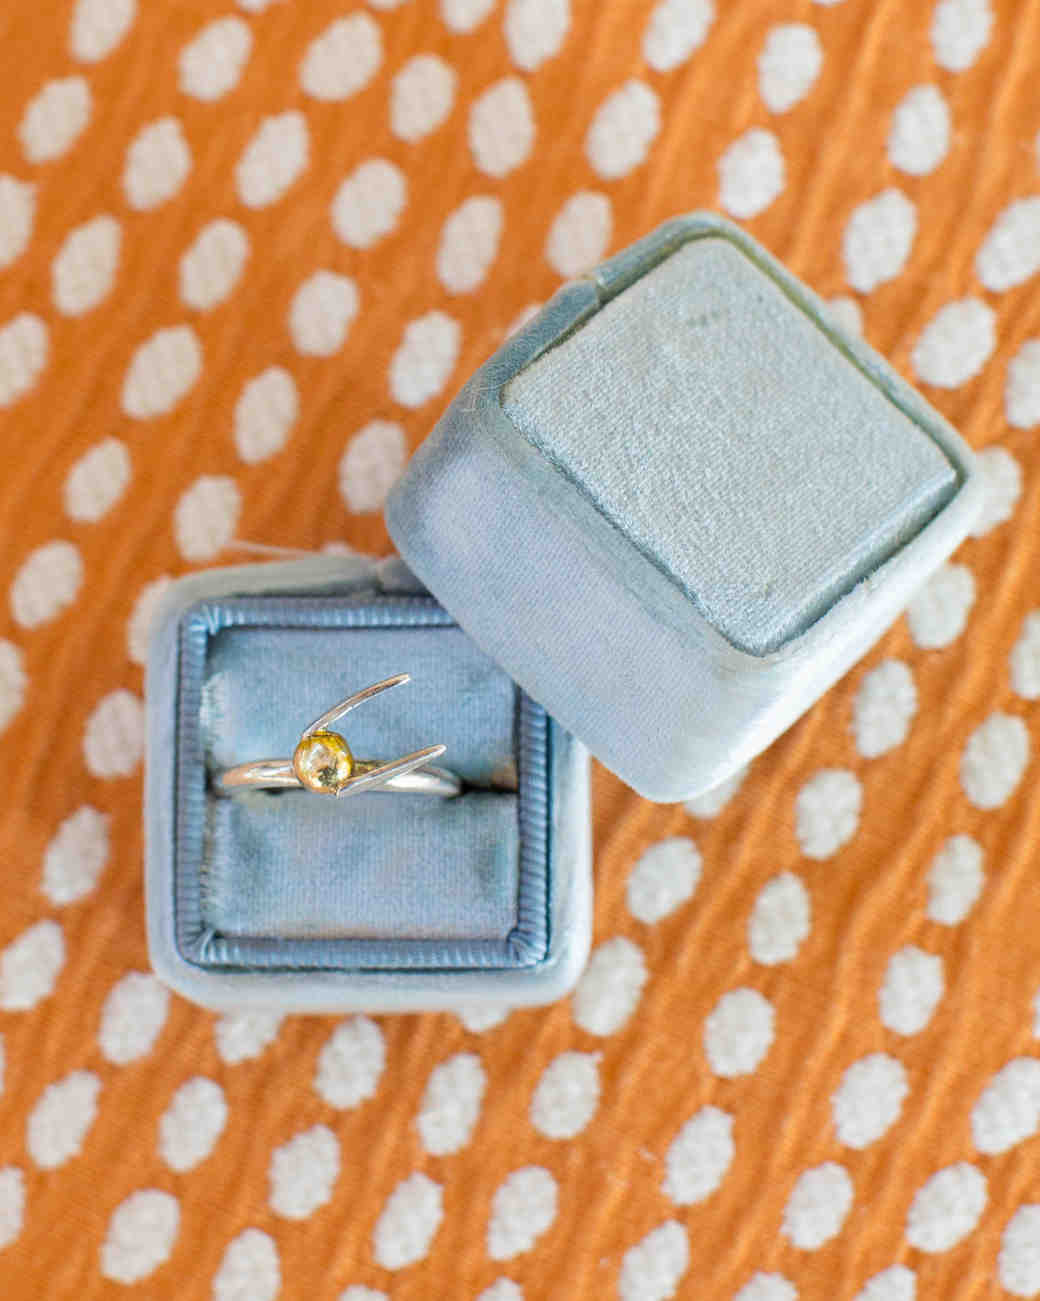 snitch ring